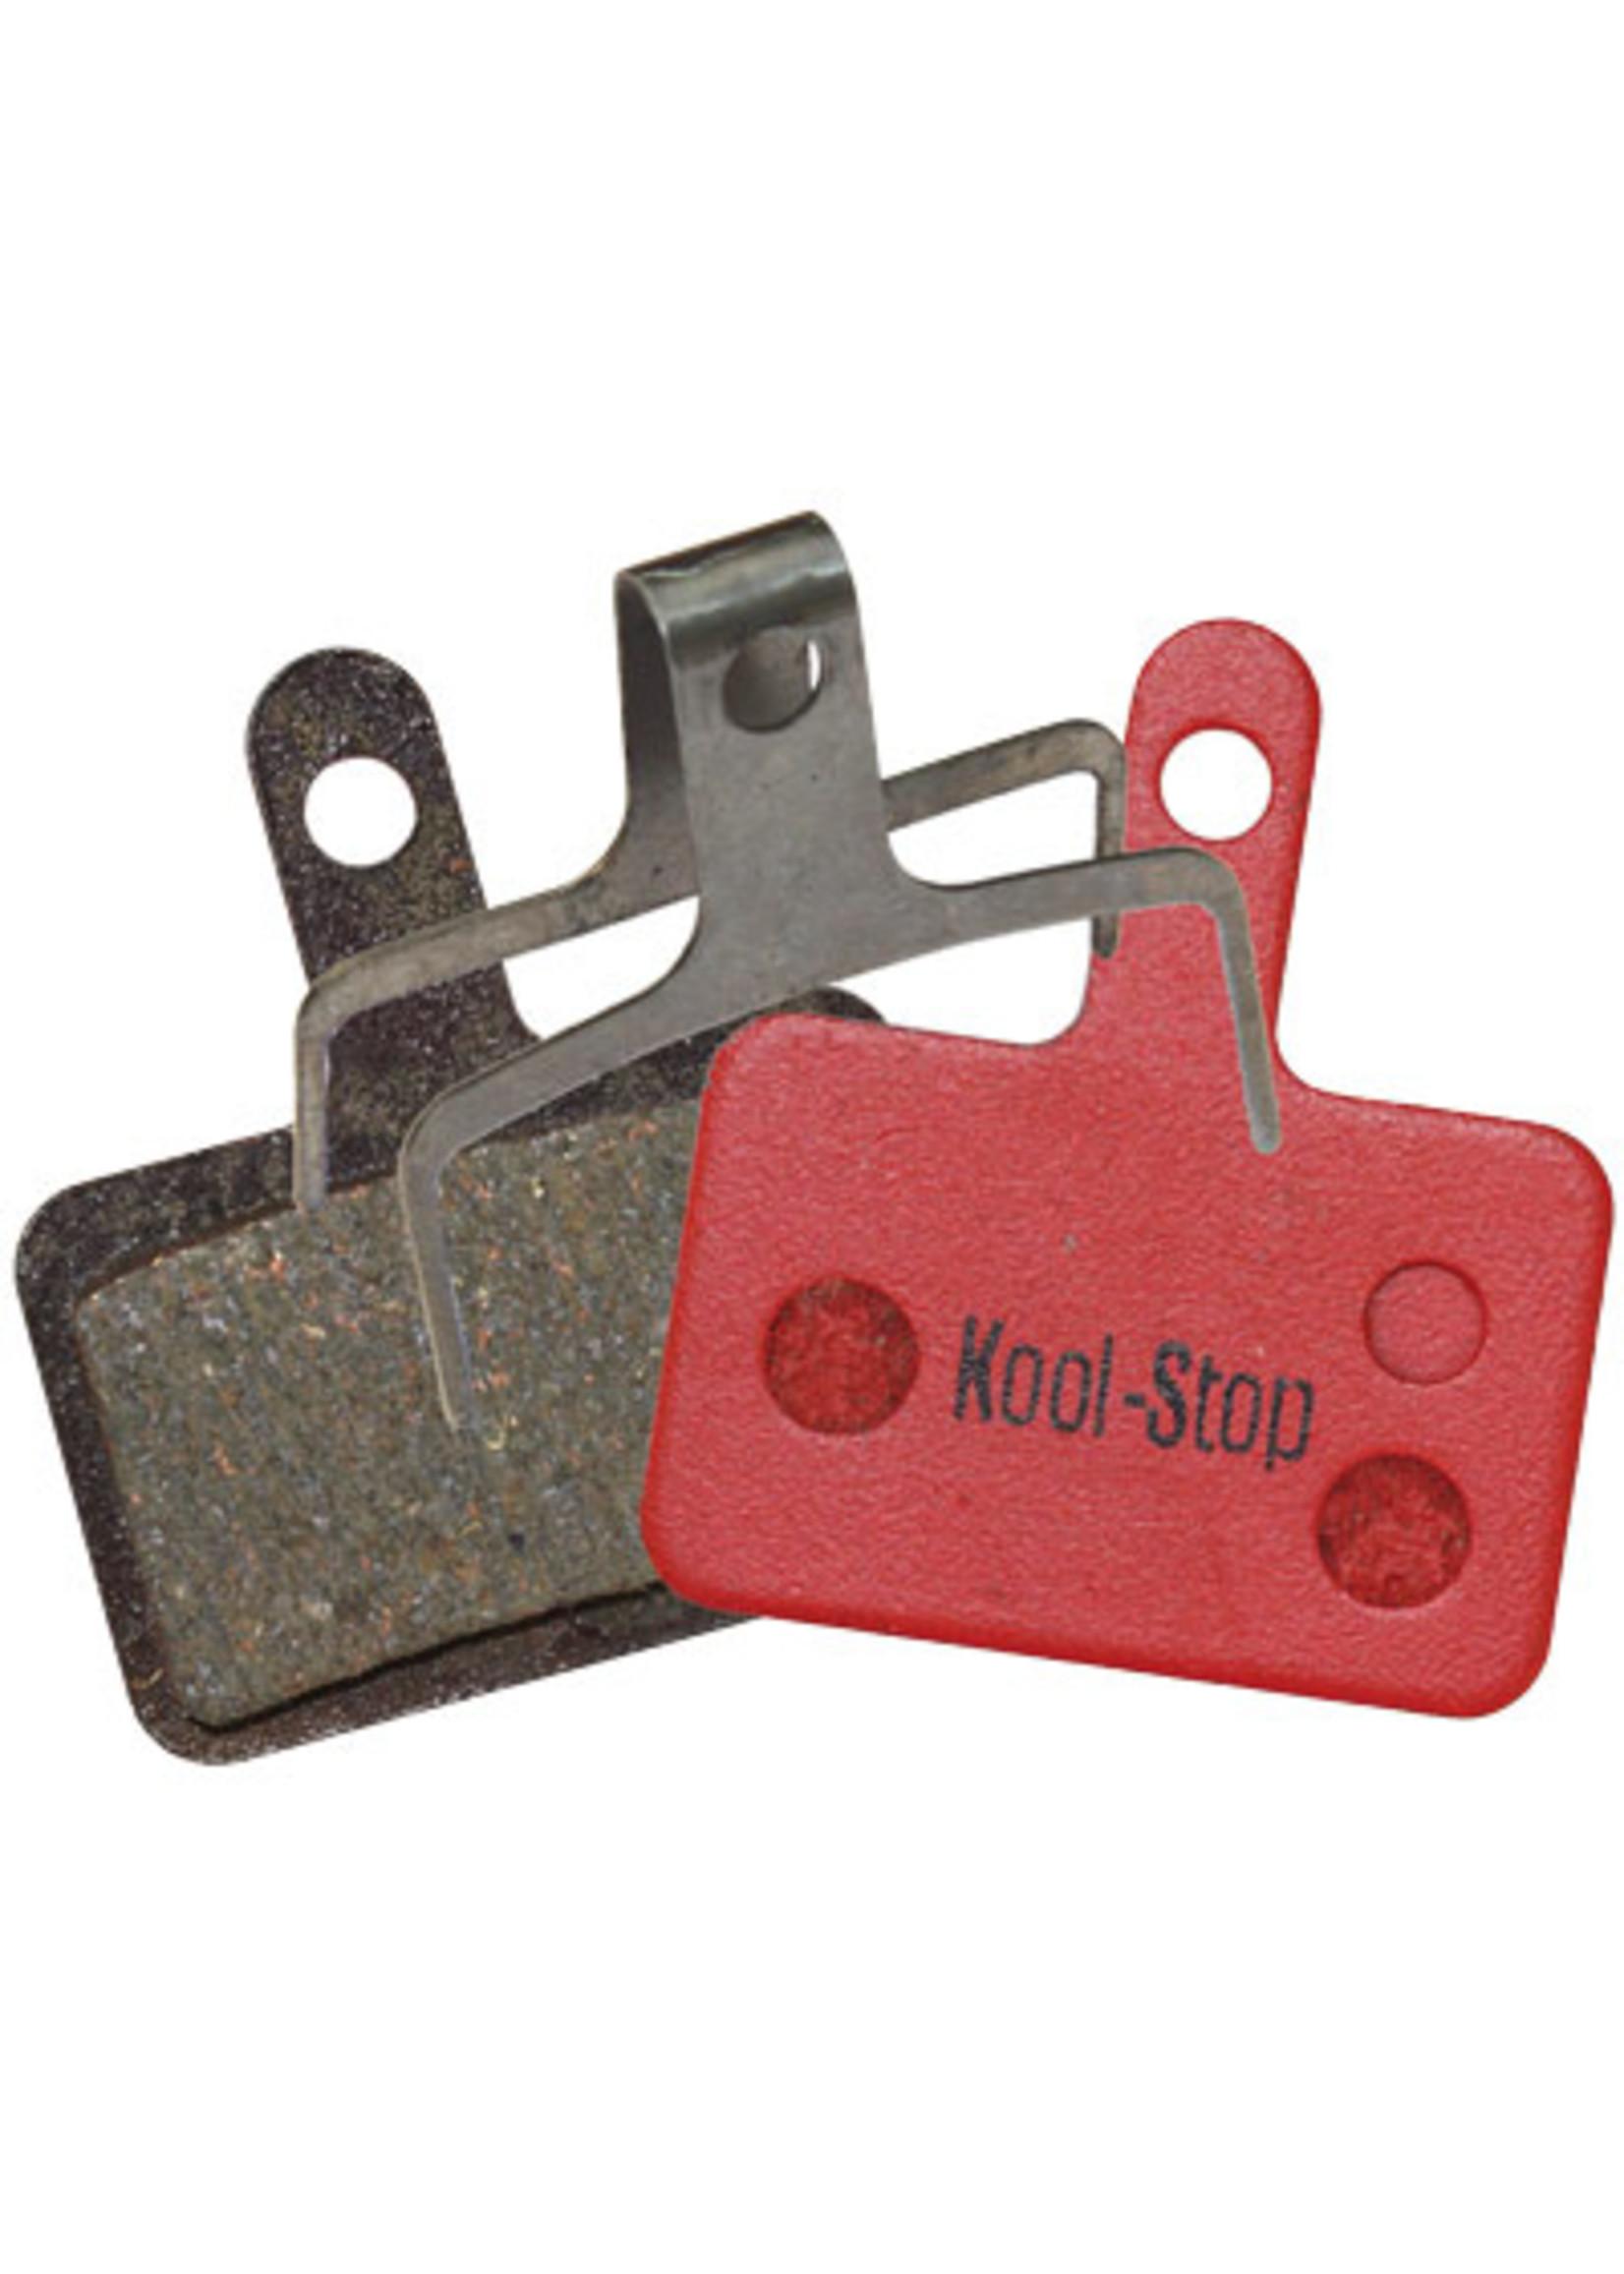 KOOLSTOP BRAKE SHOES K/S DISC SHI DEORE MECH/HYDM515/M525